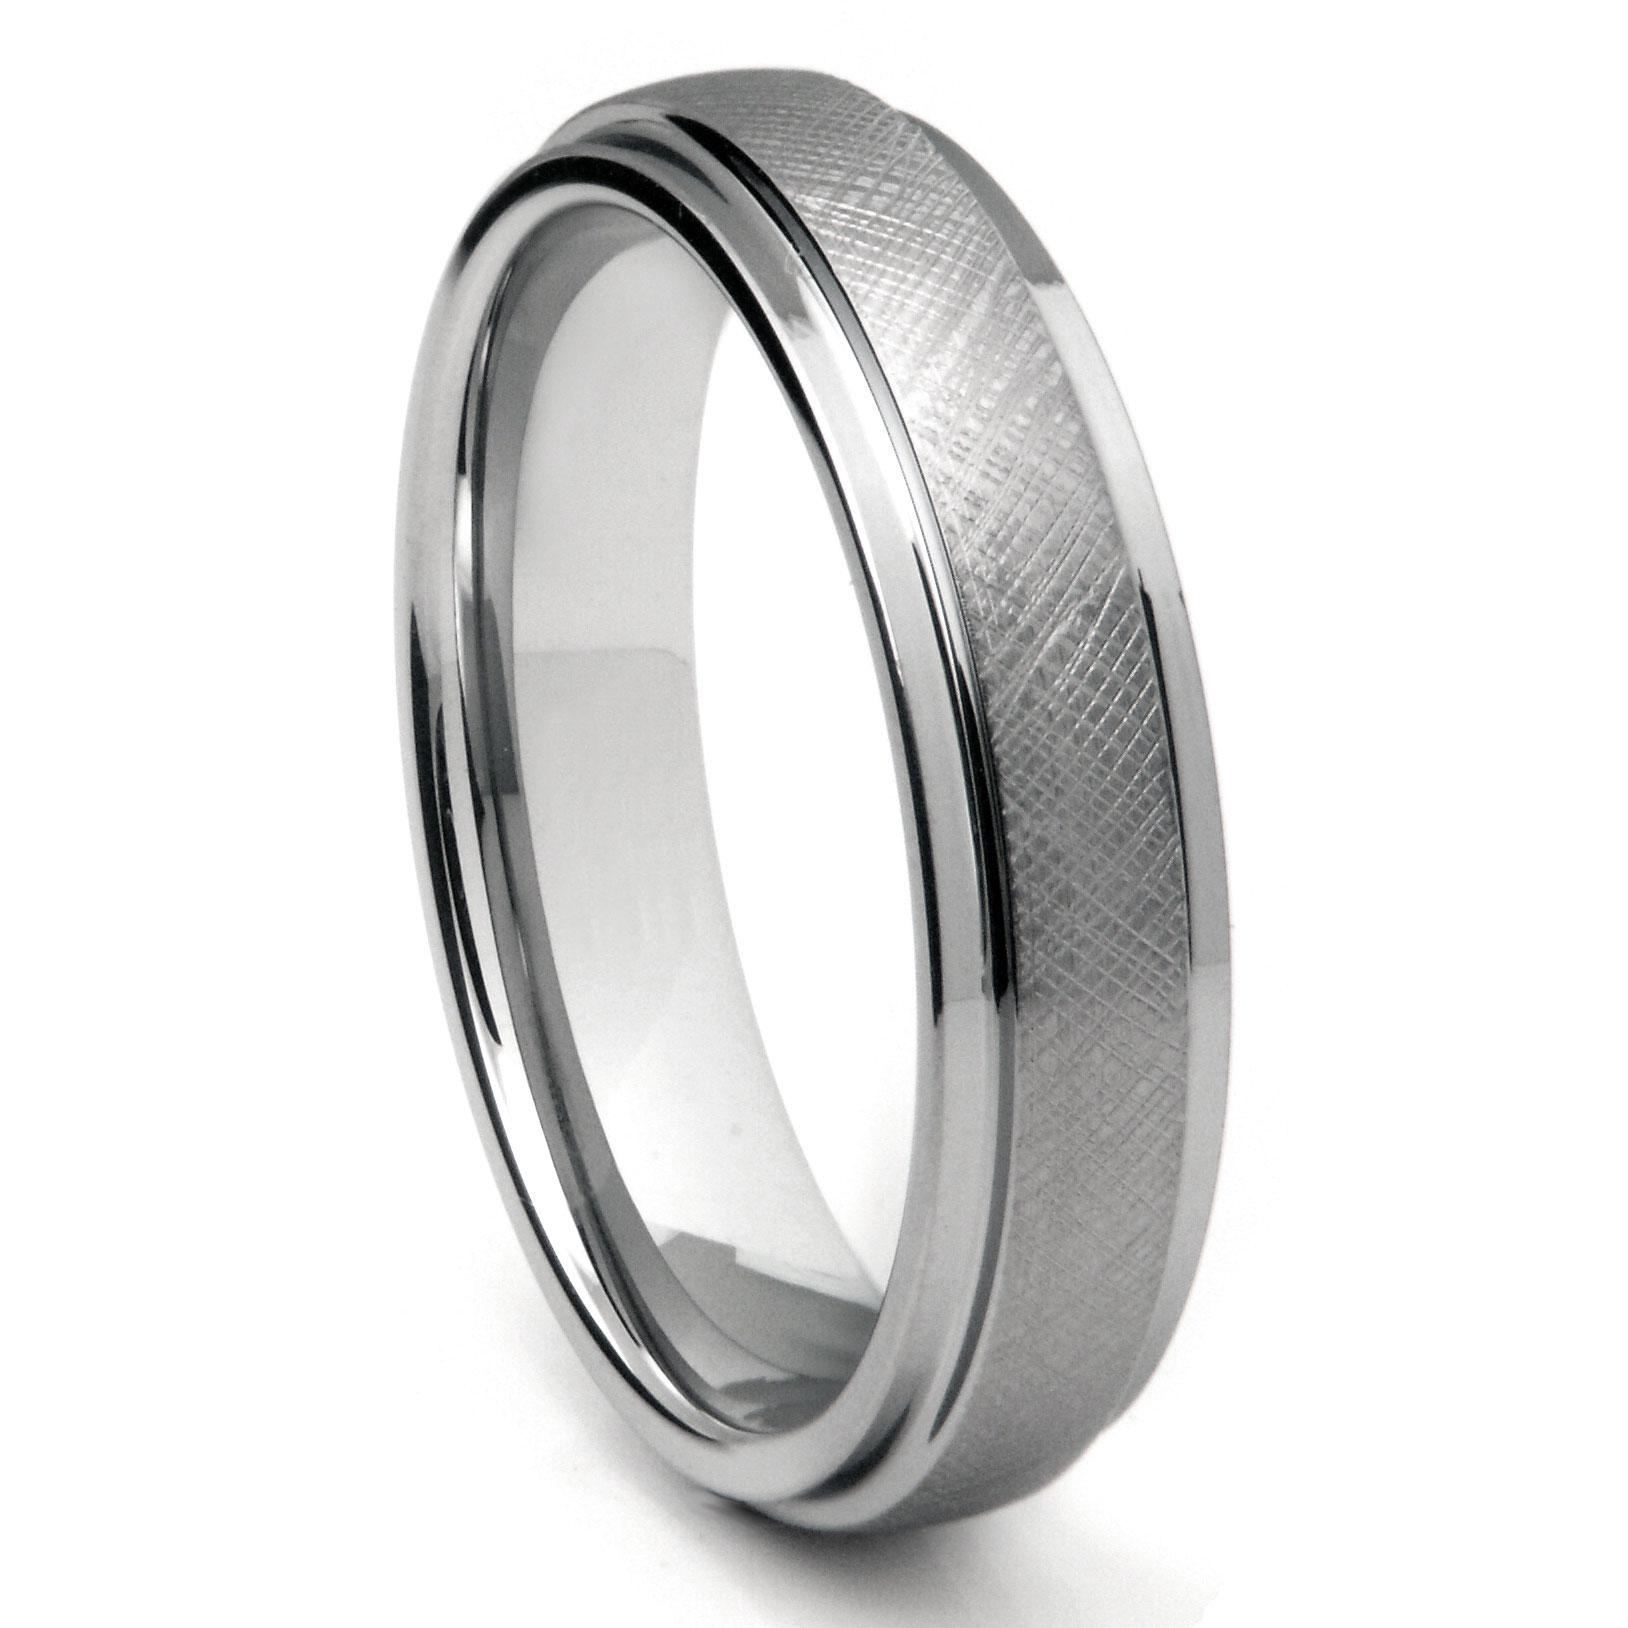 Tungsten Carbide 6MM Mesh Finish Wedding Band Ring